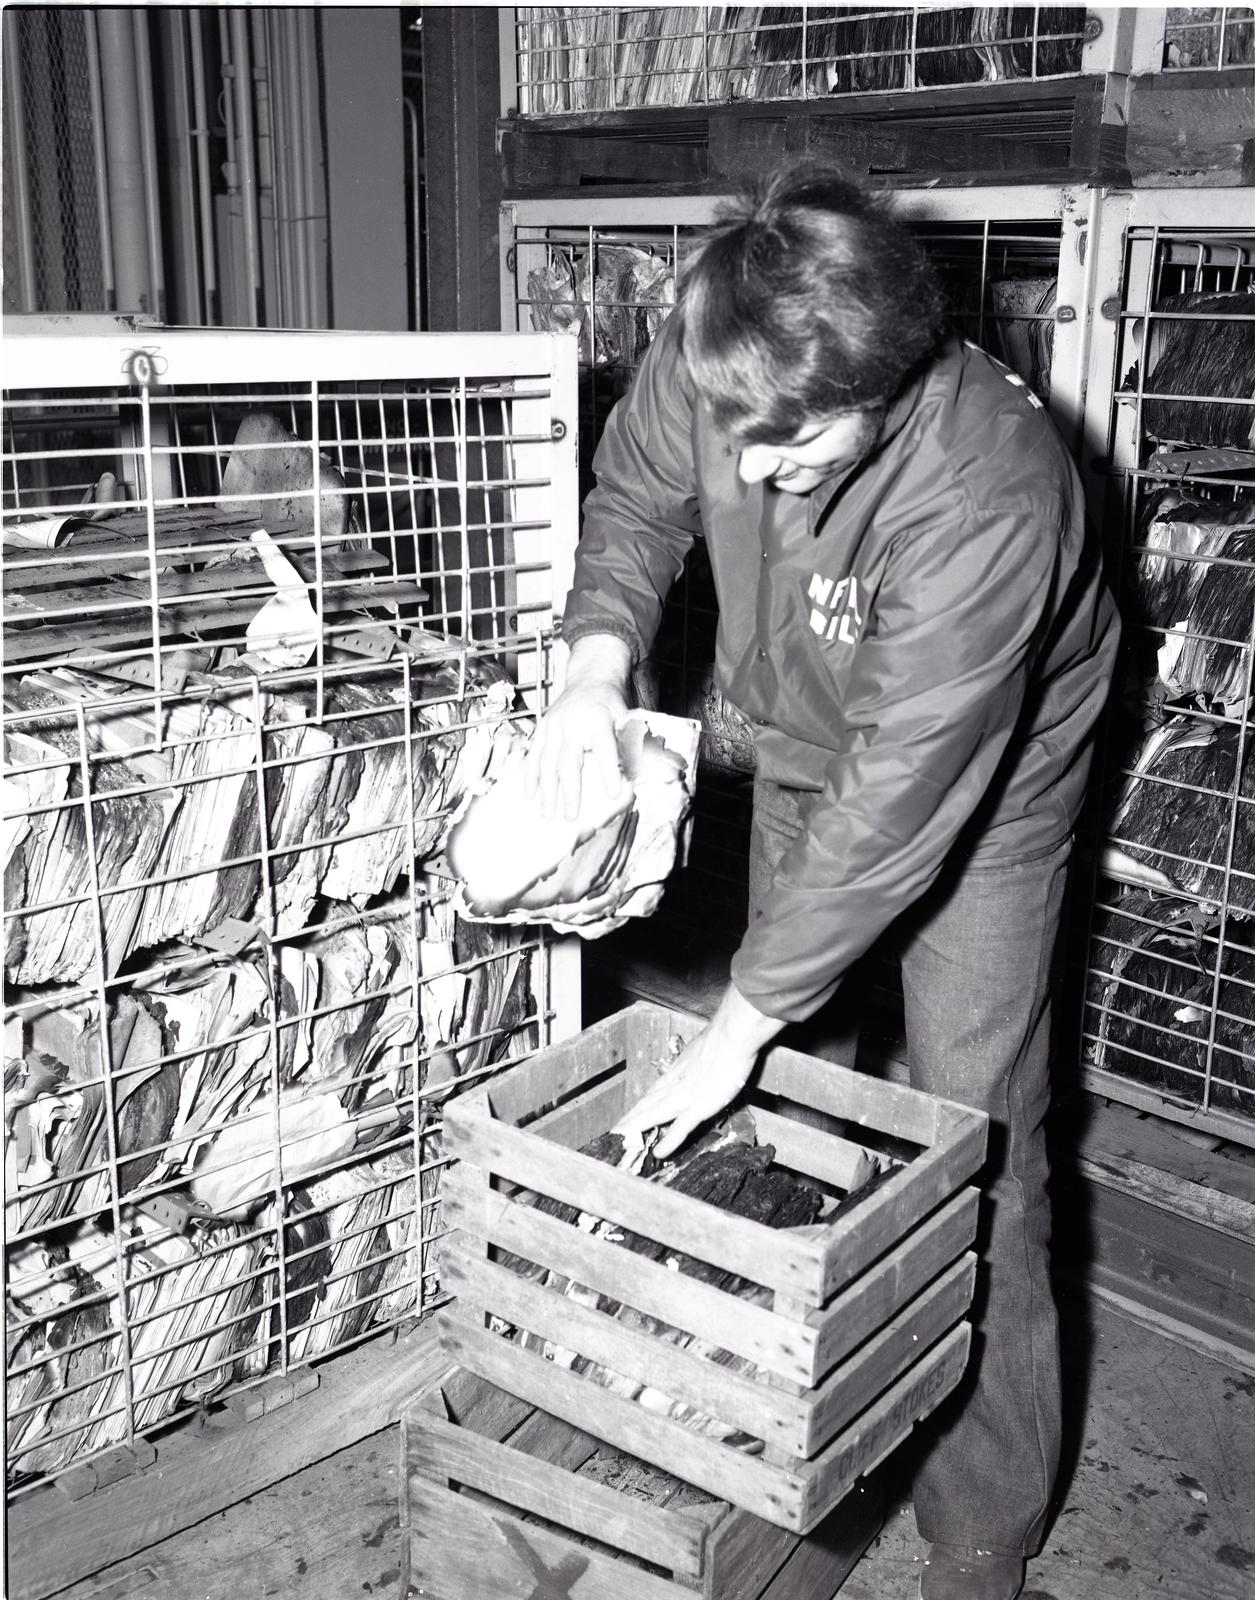 PAPER DRYING PROJECT - B-2 FACILITY NATIONAL RECORD CENTER FIRE - NASA PLUM BROOK STATION SANDUSKY OHIO